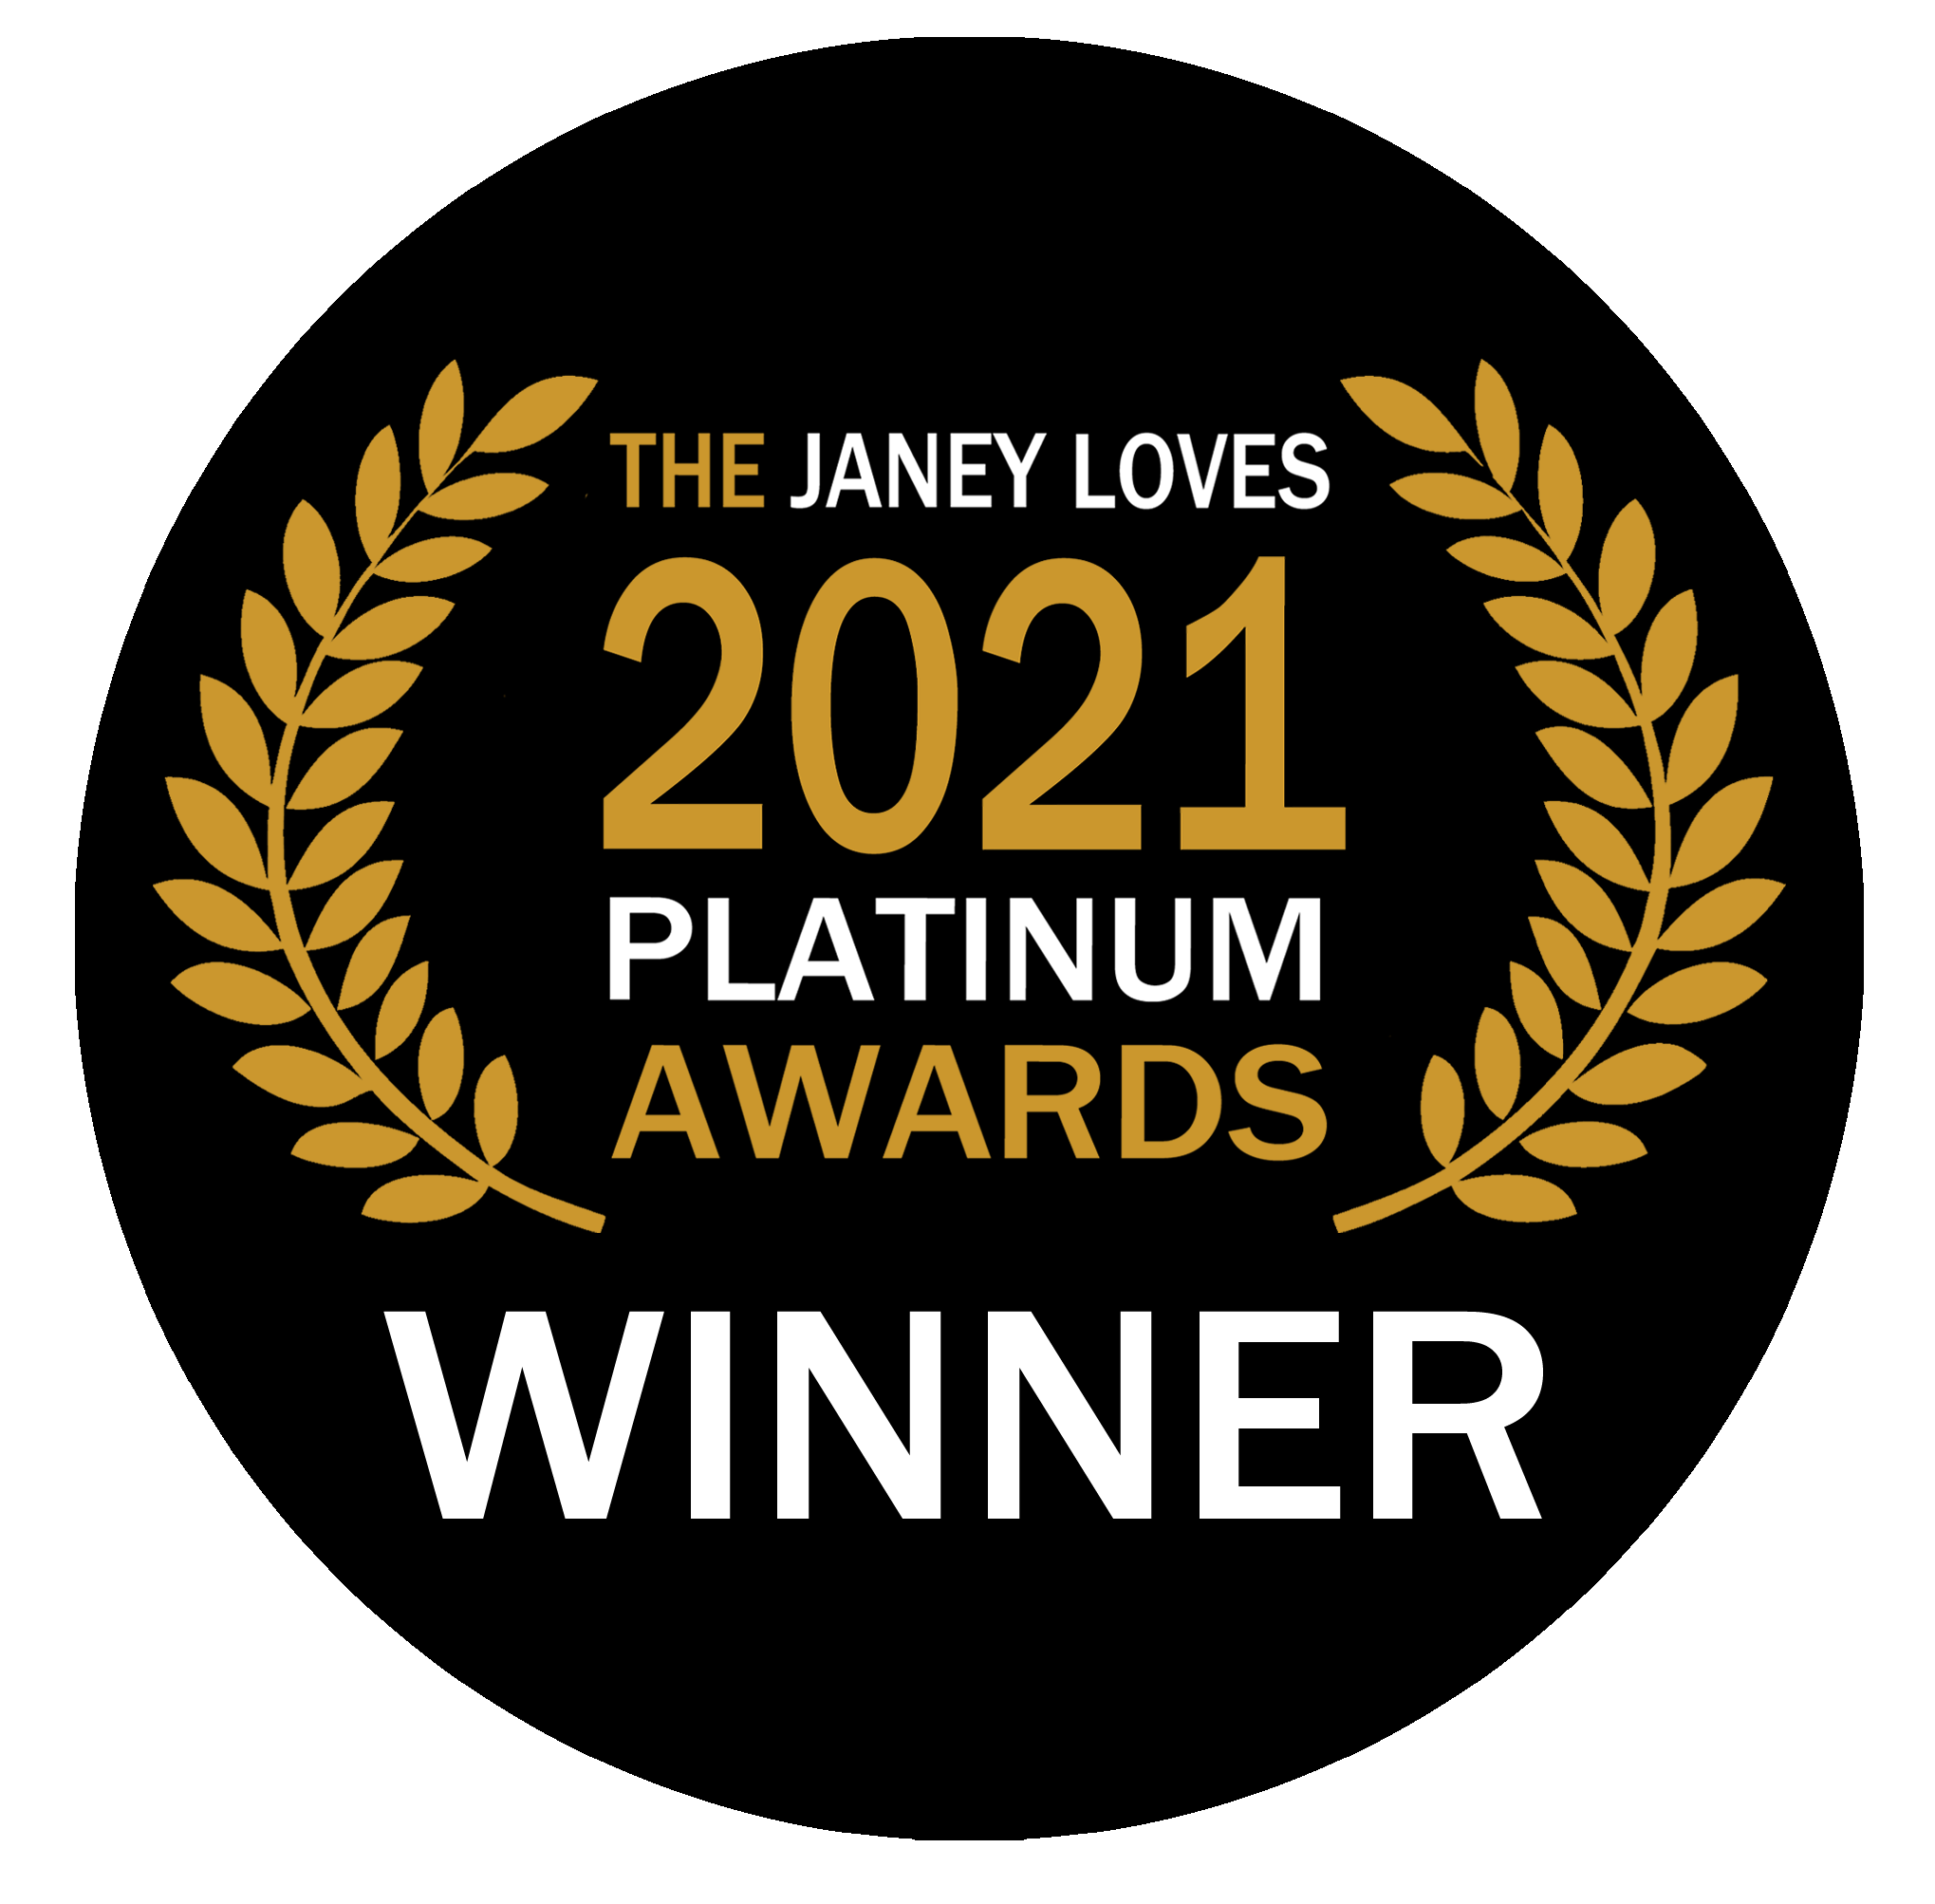 Green 8 Transformer 28-5G - Winner of the 2021 Janey Loves PLATINUM AWARD